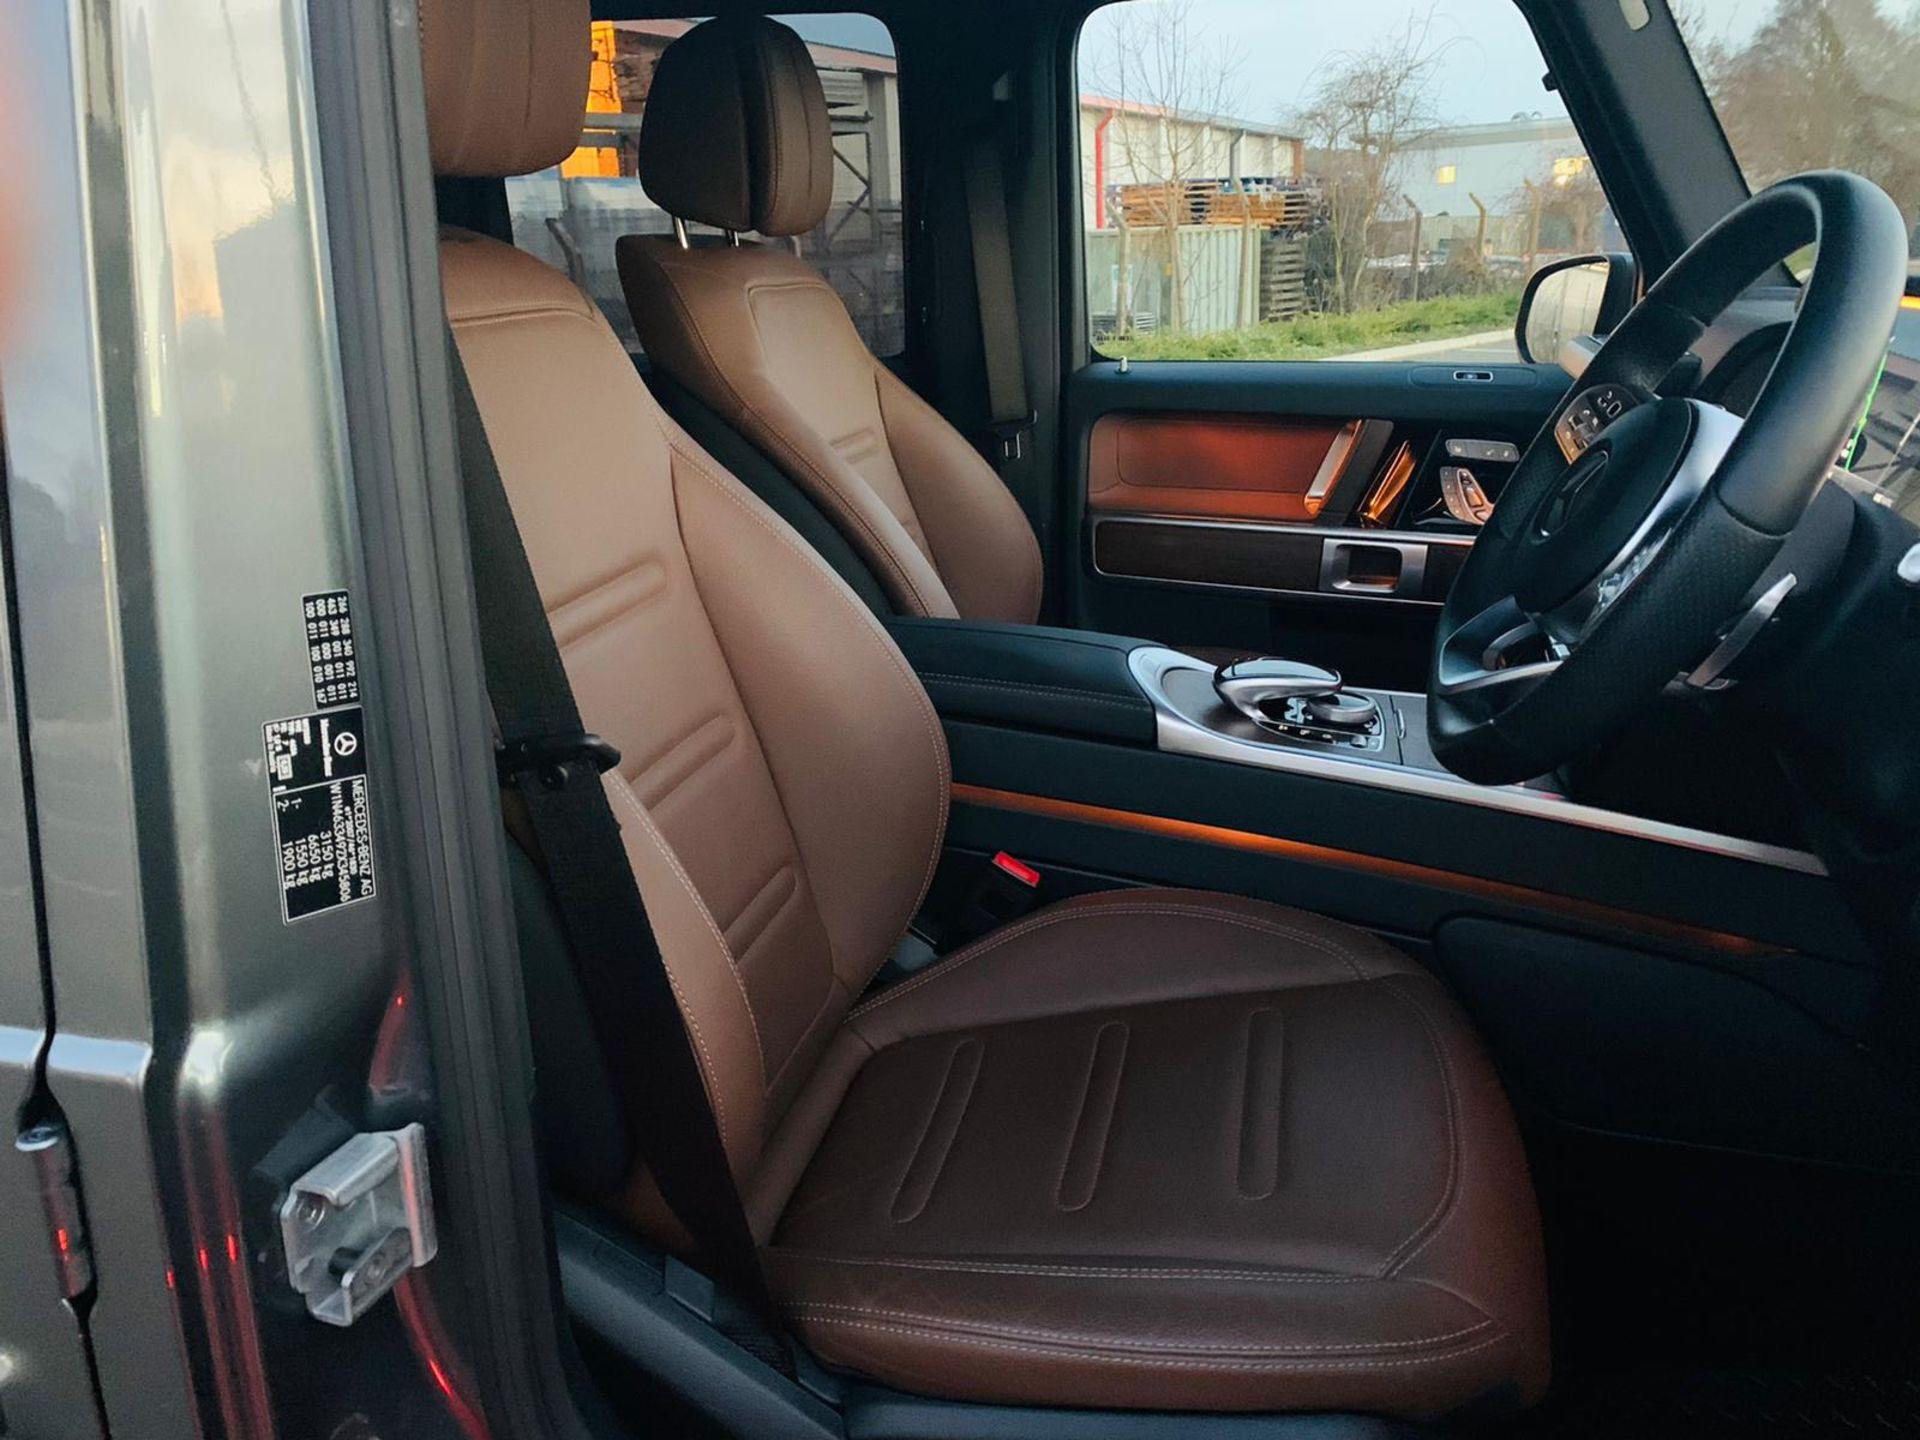 Mercedes G350d AMG LINE 9G-Tronic+ 4Matic 2020 20 Reg - 1 Owner - Only 9k Miles - HUGE SPEC - Image 17 of 41